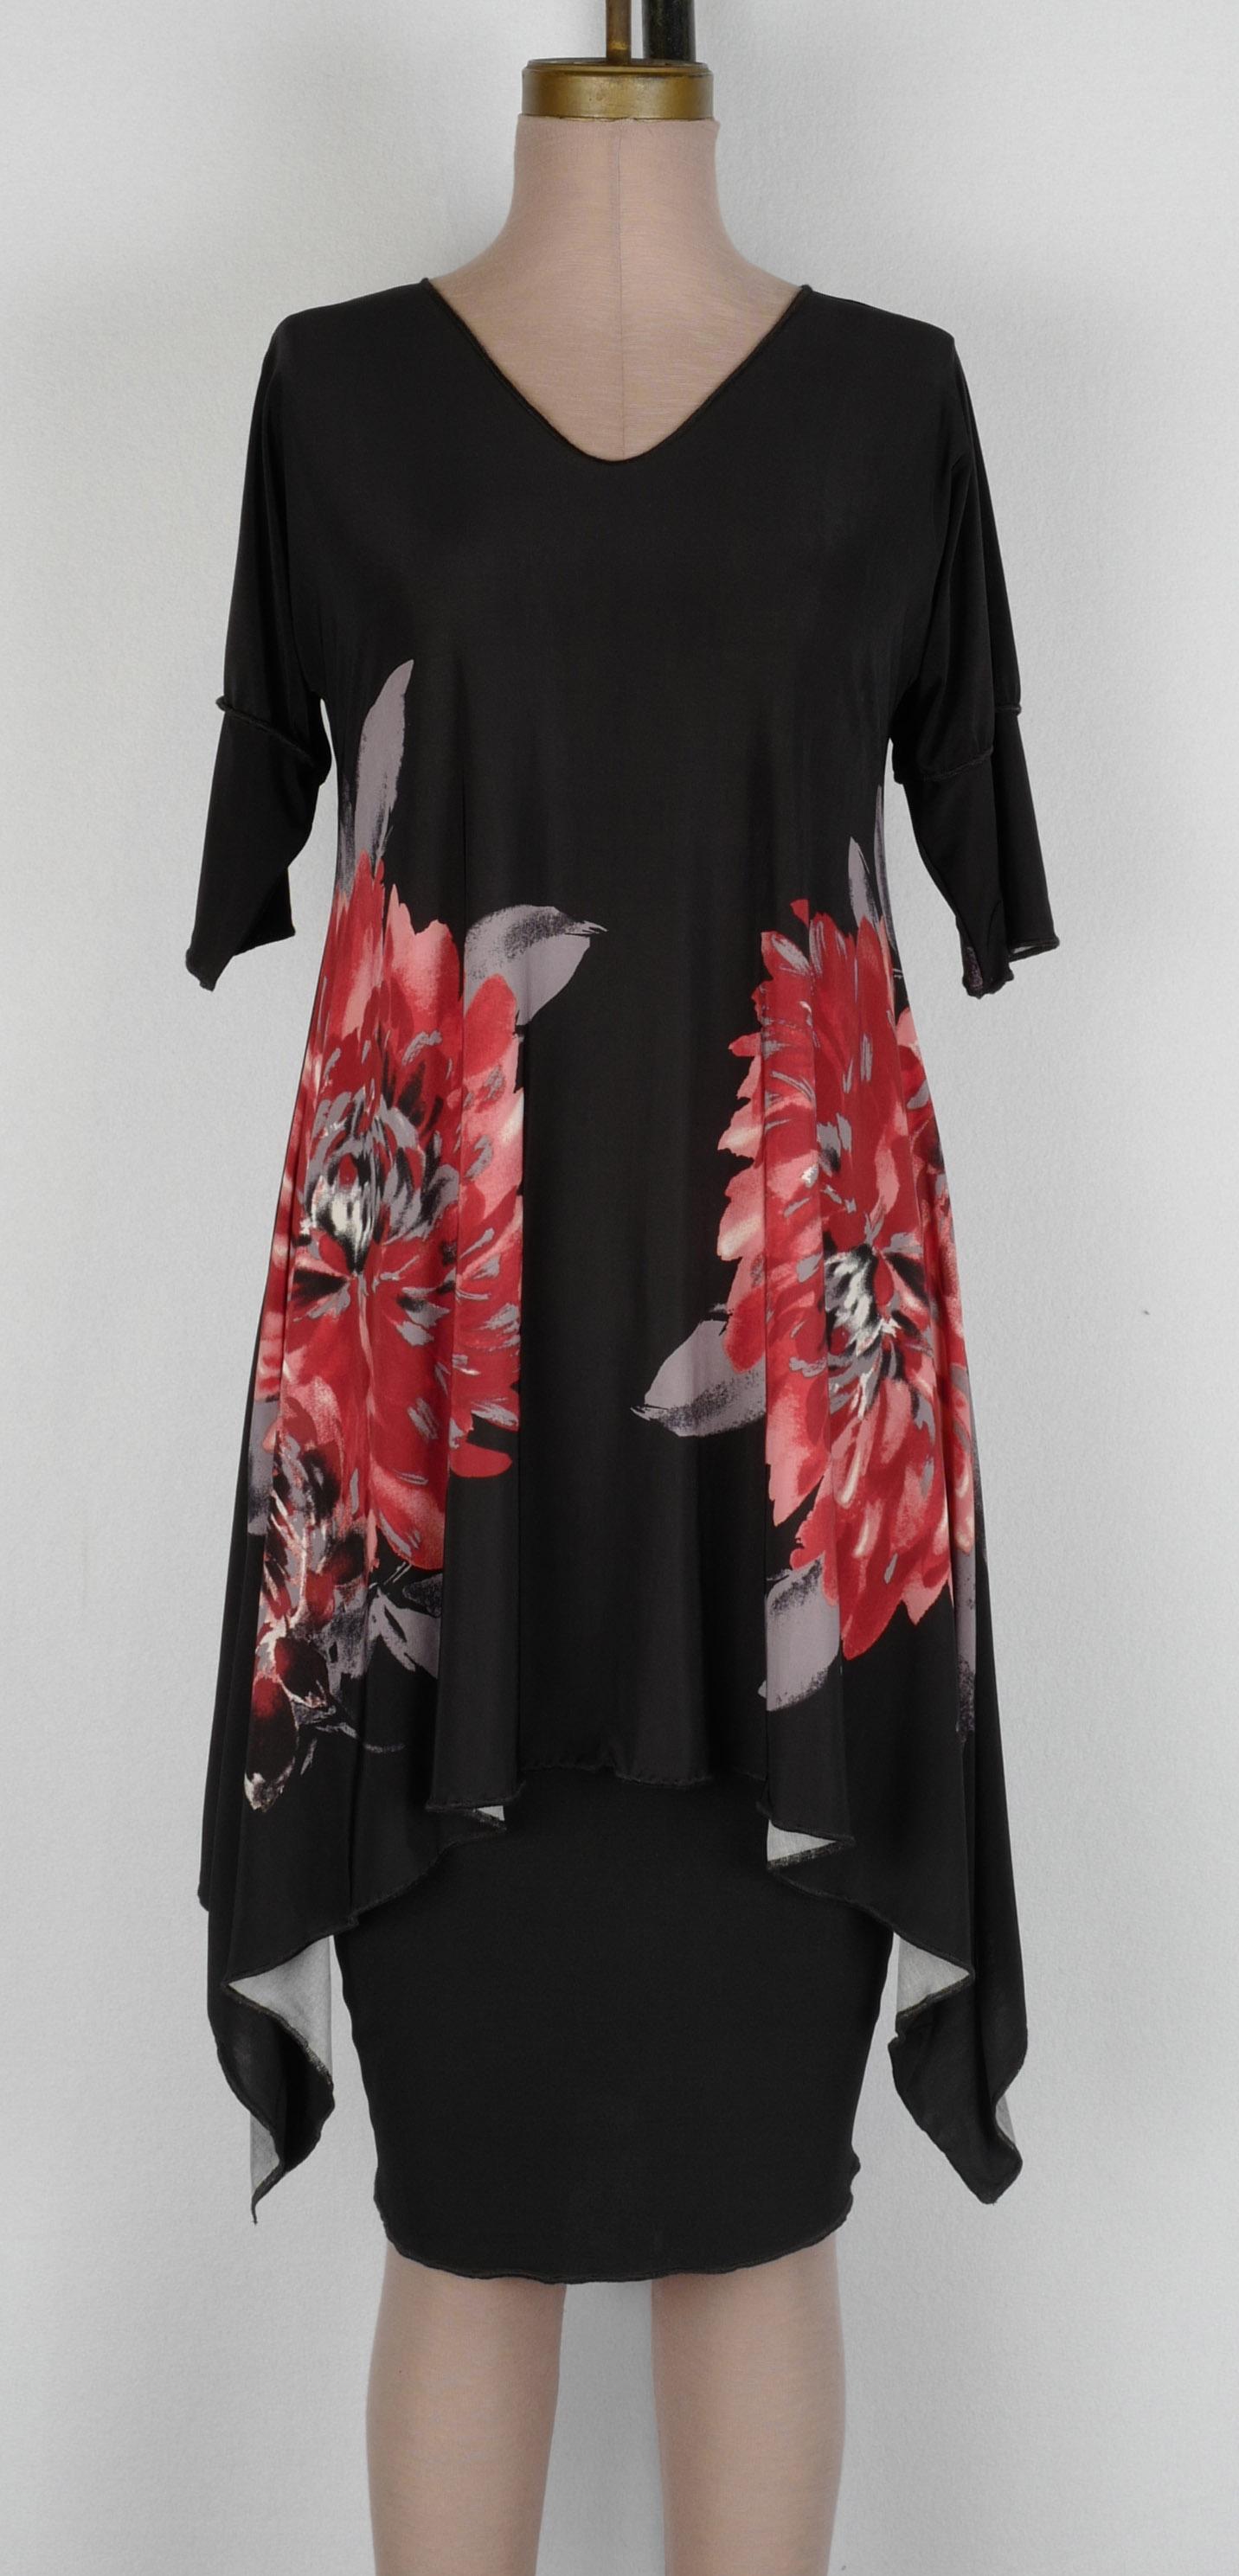 Short Sleeved Cuff V Arch Tunic $135 • S M L XL